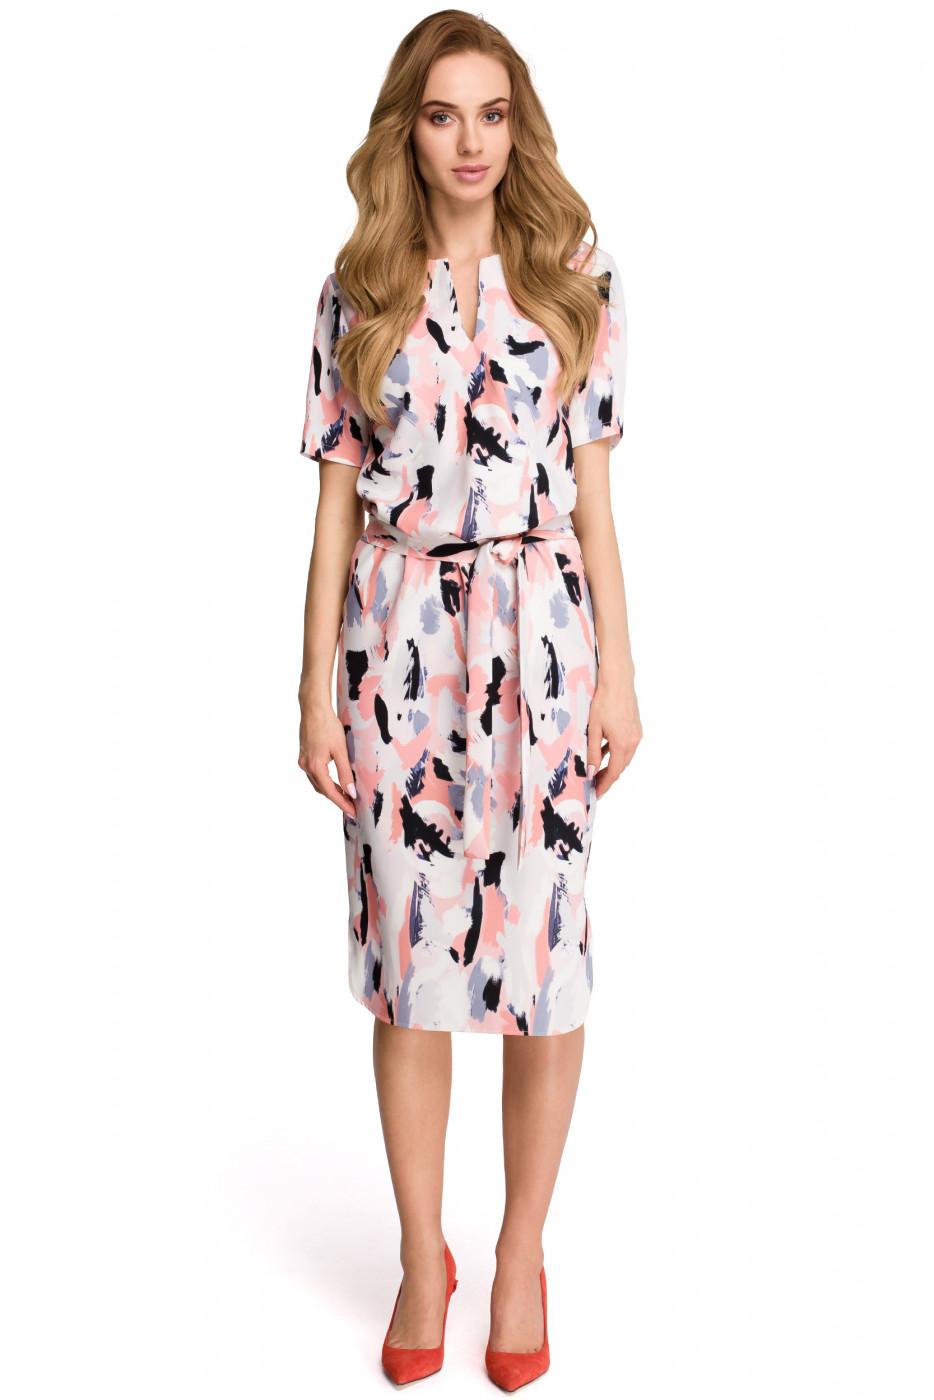 Stylove Woman's Dress S114 Model 2